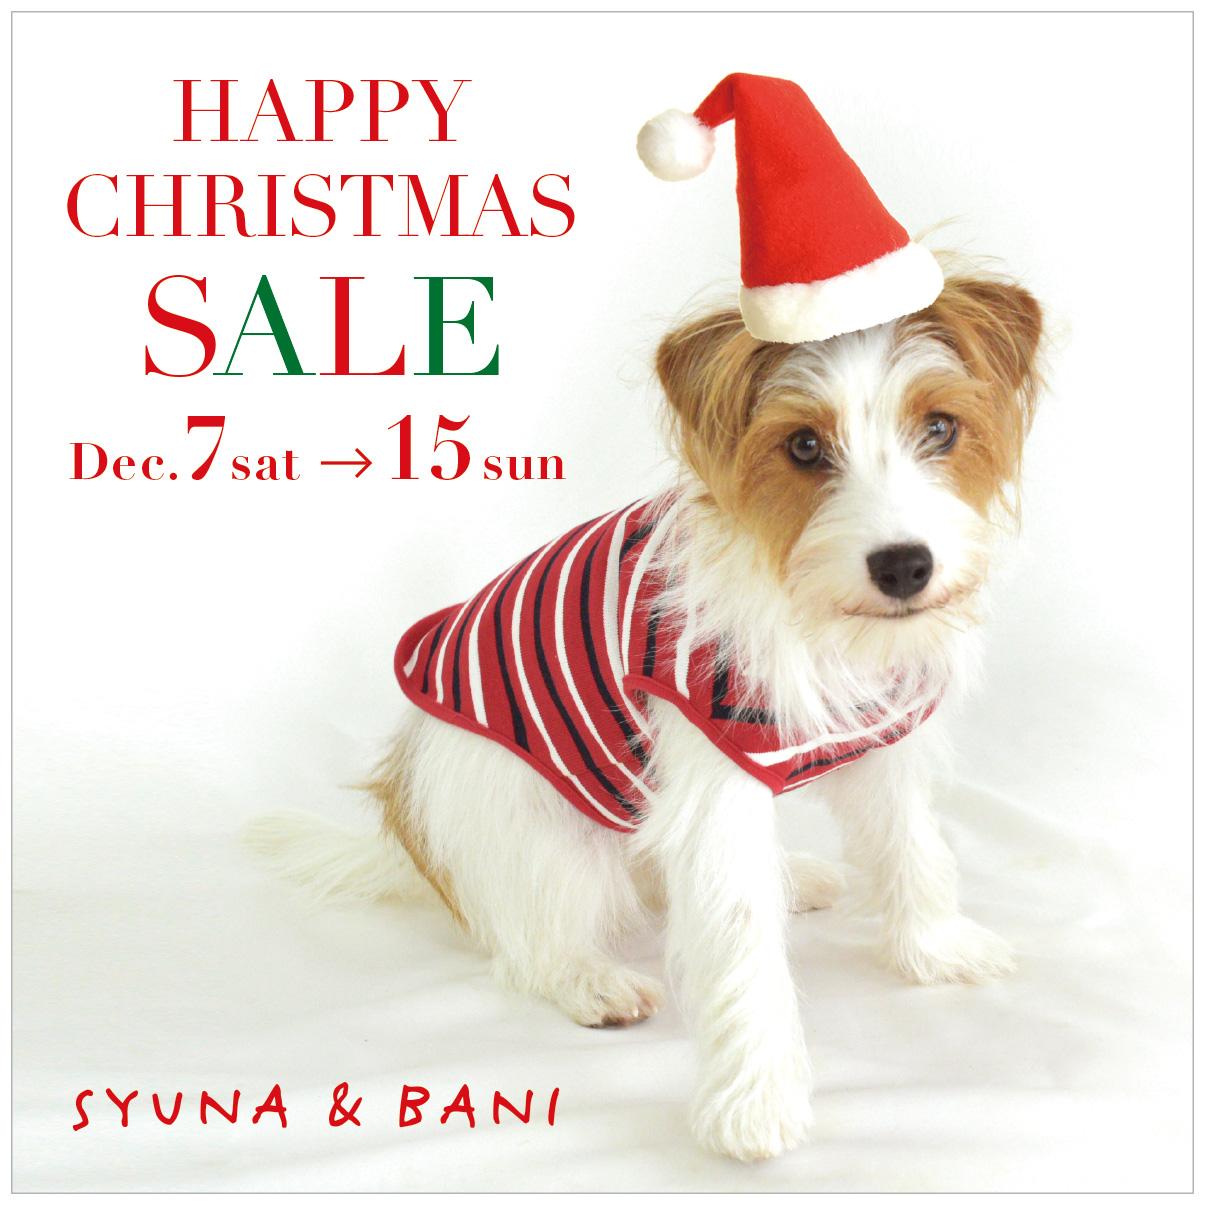 http://syuna-bani.net/blog/191205_Xmas_sale.jpg